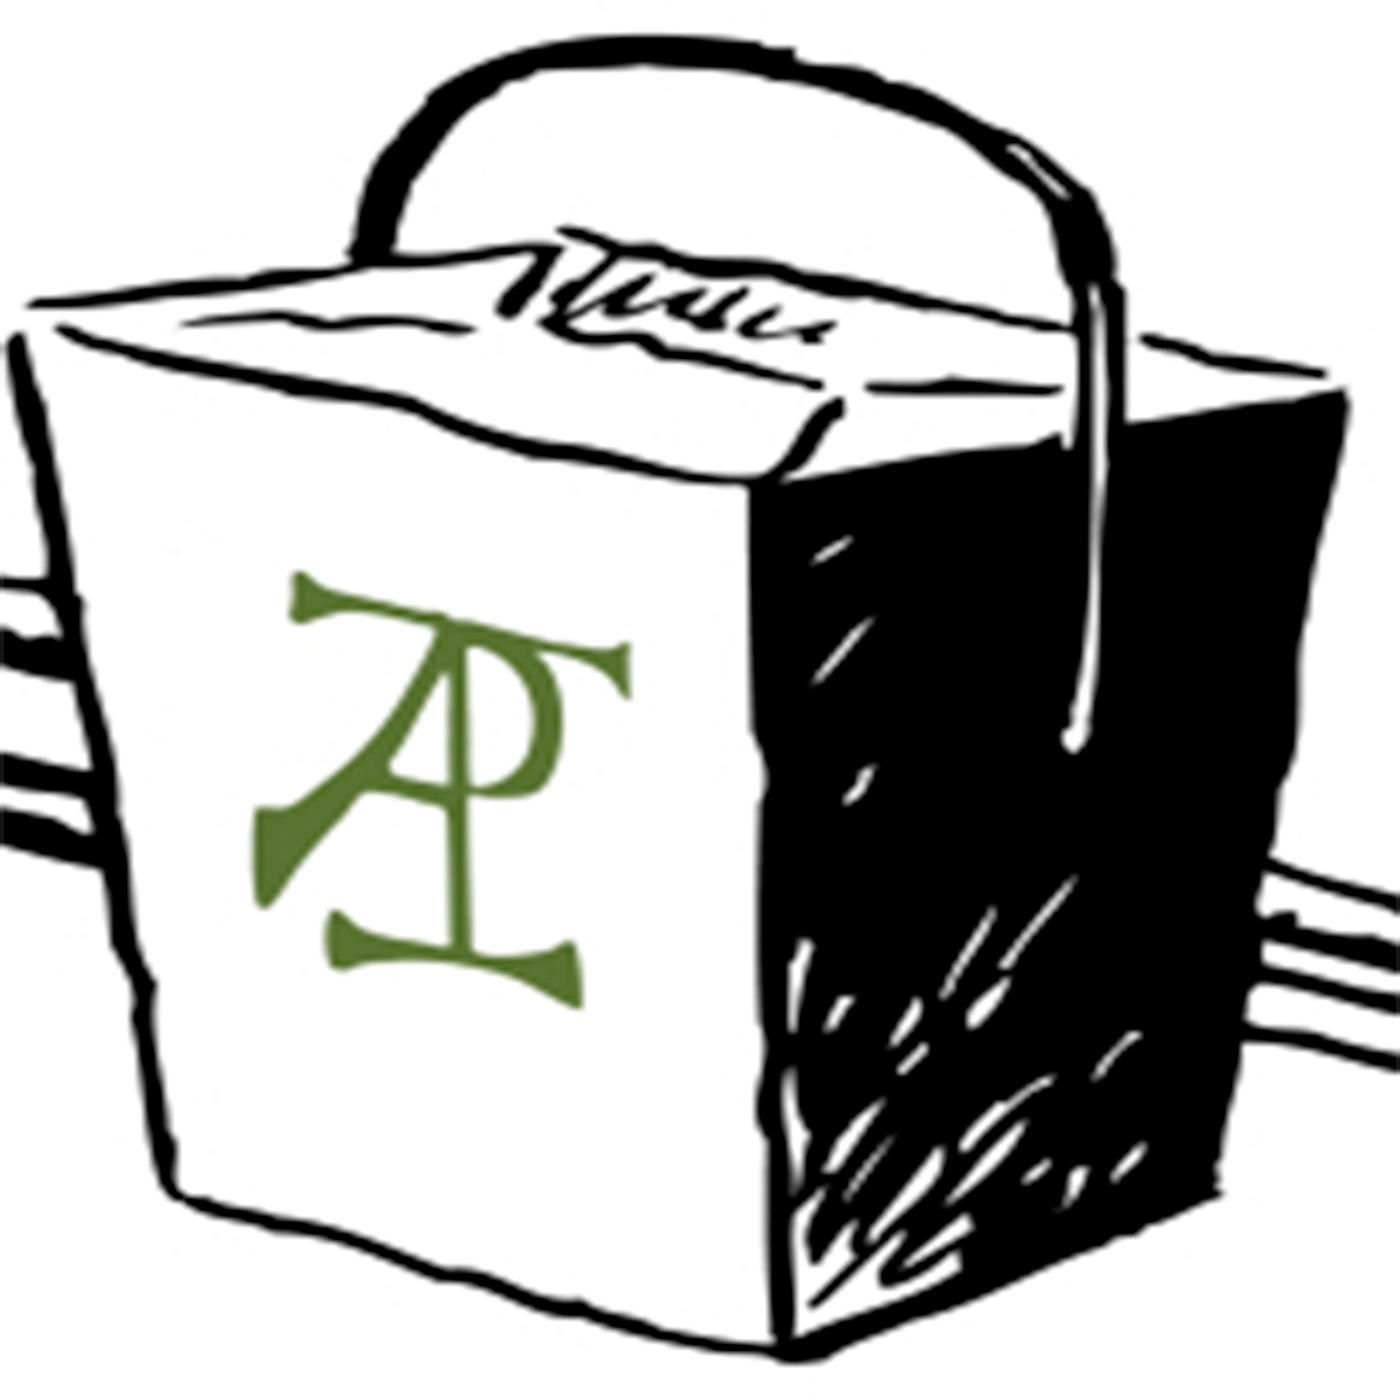 APT_Talkbacks_Logo_for_iTunes.png